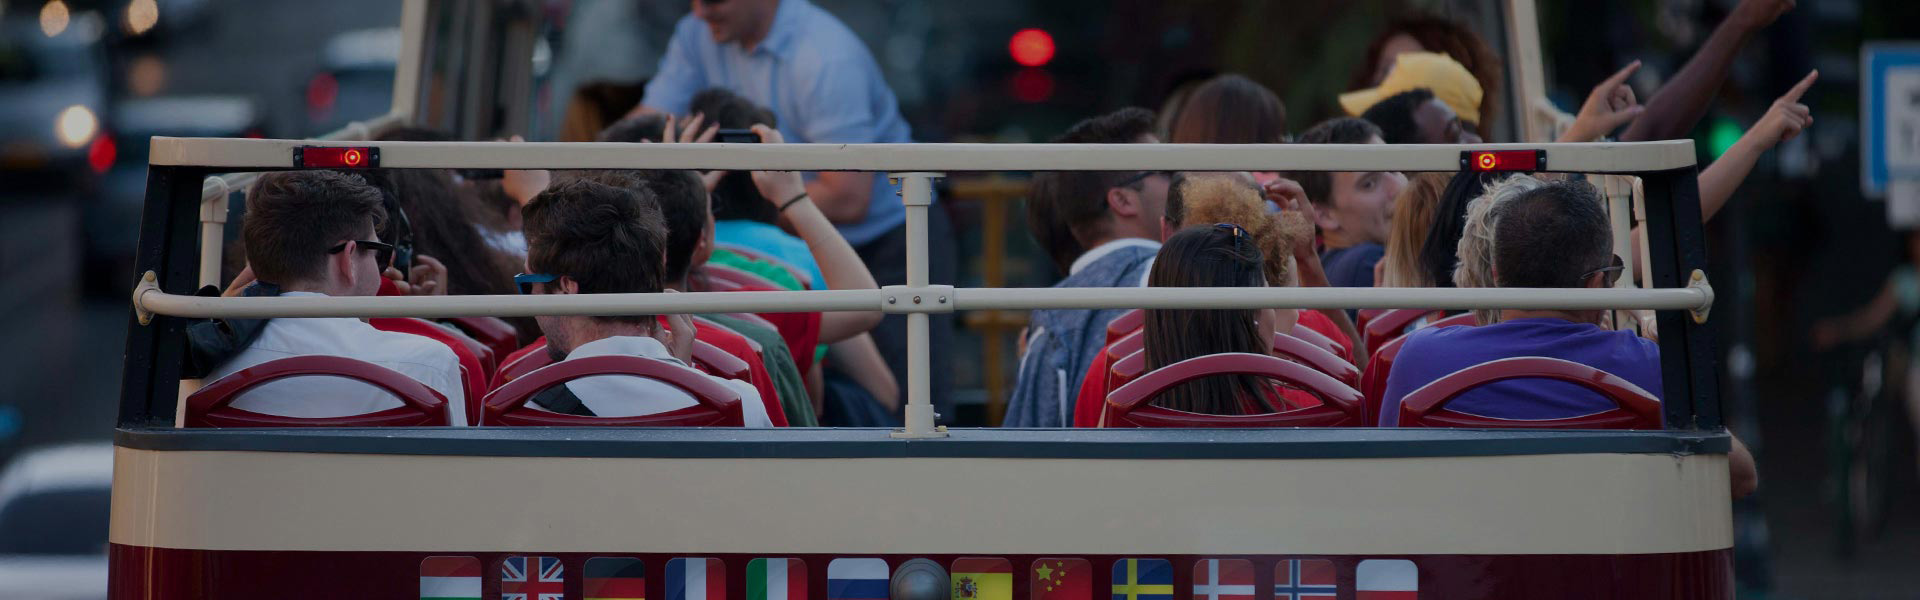 People on sightseeing bus tour in Philadelphia